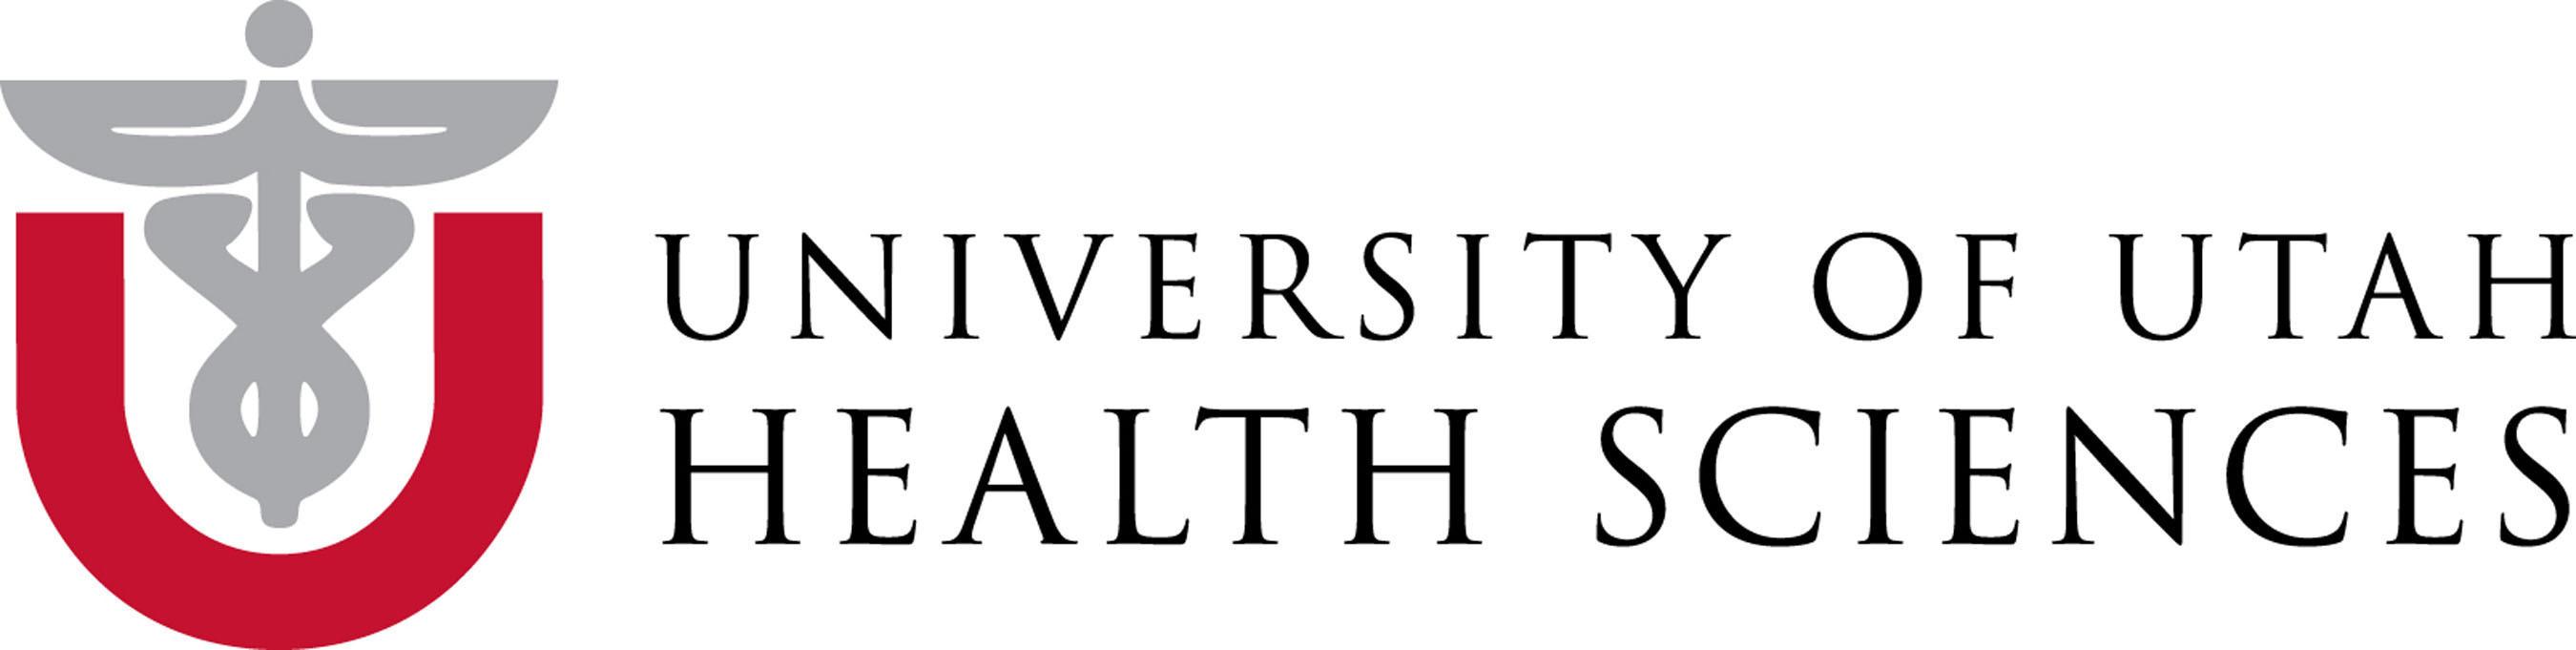 University of Utah Health Sciences Logo. (PRNewsFoto/Huntsman Cancer Institute at the University of Utah) (PRNewsFoto/HUNTSMAN CANCER INSTITUTE...)